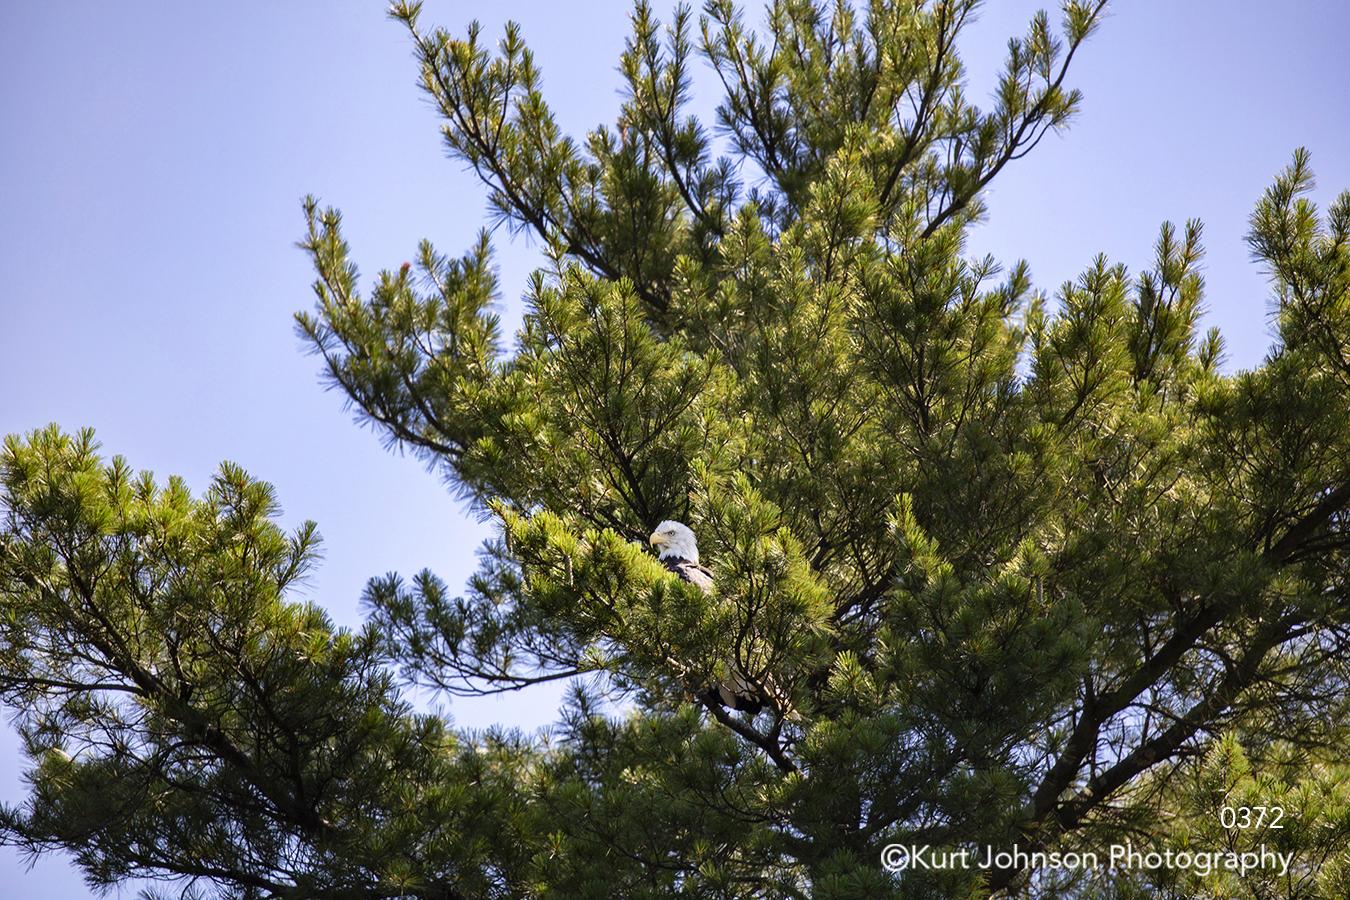 wildlife eagle bird animal green tree blue sky